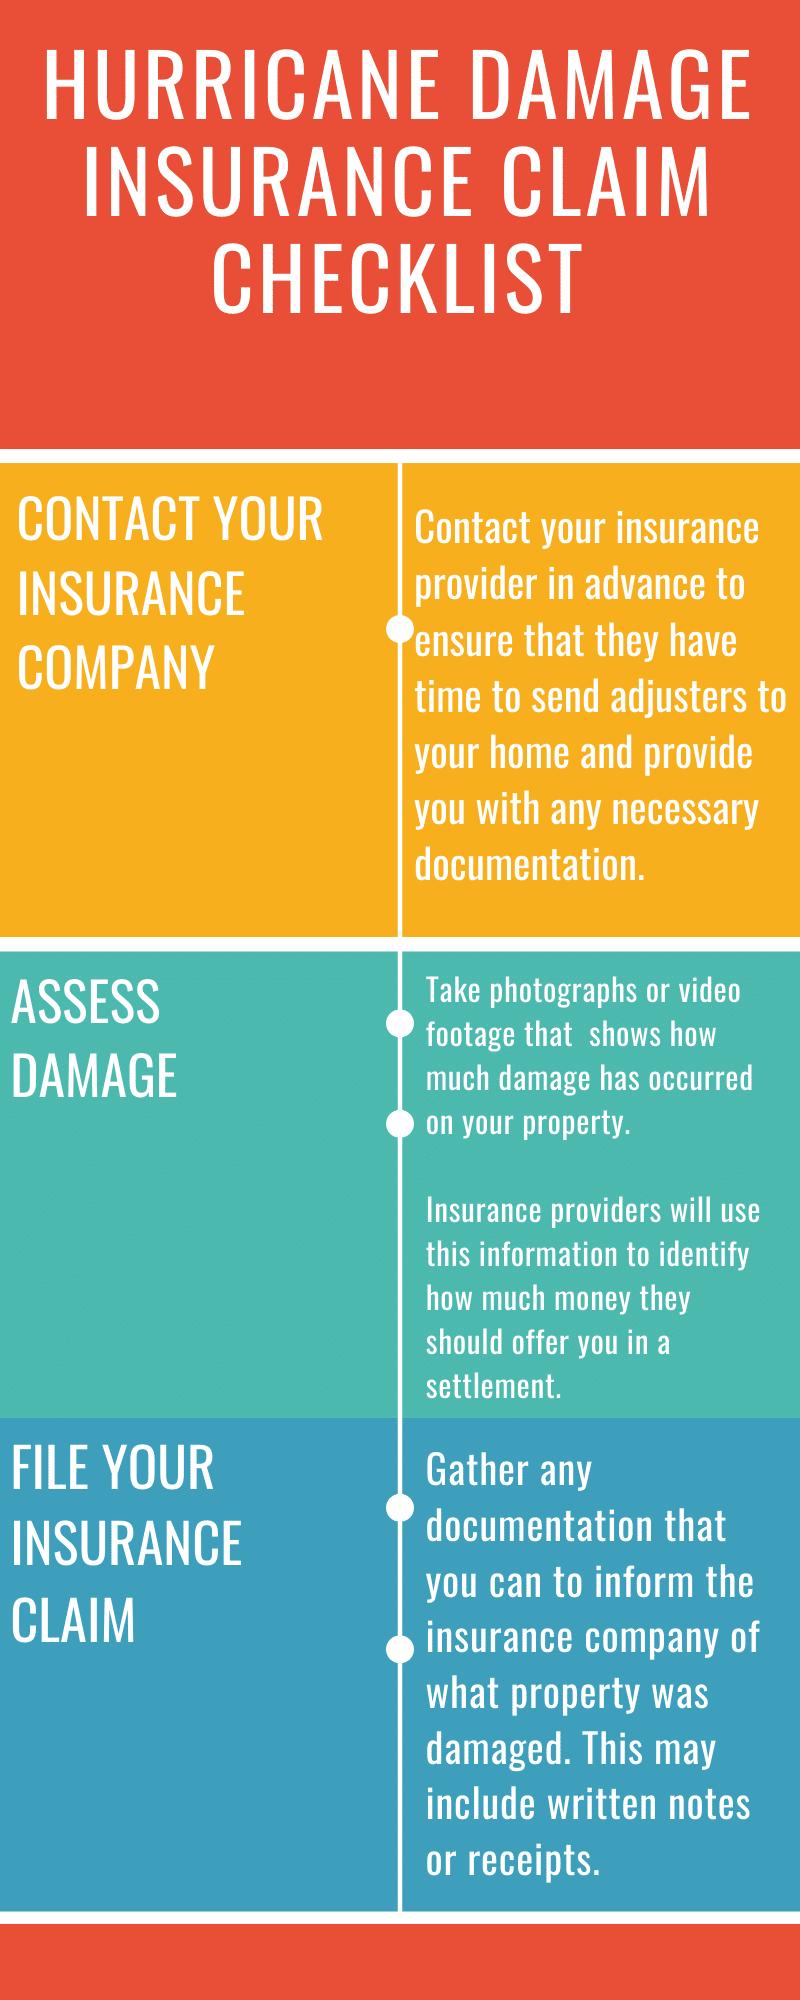 Hurricane Damage Insurance Claim Checklist